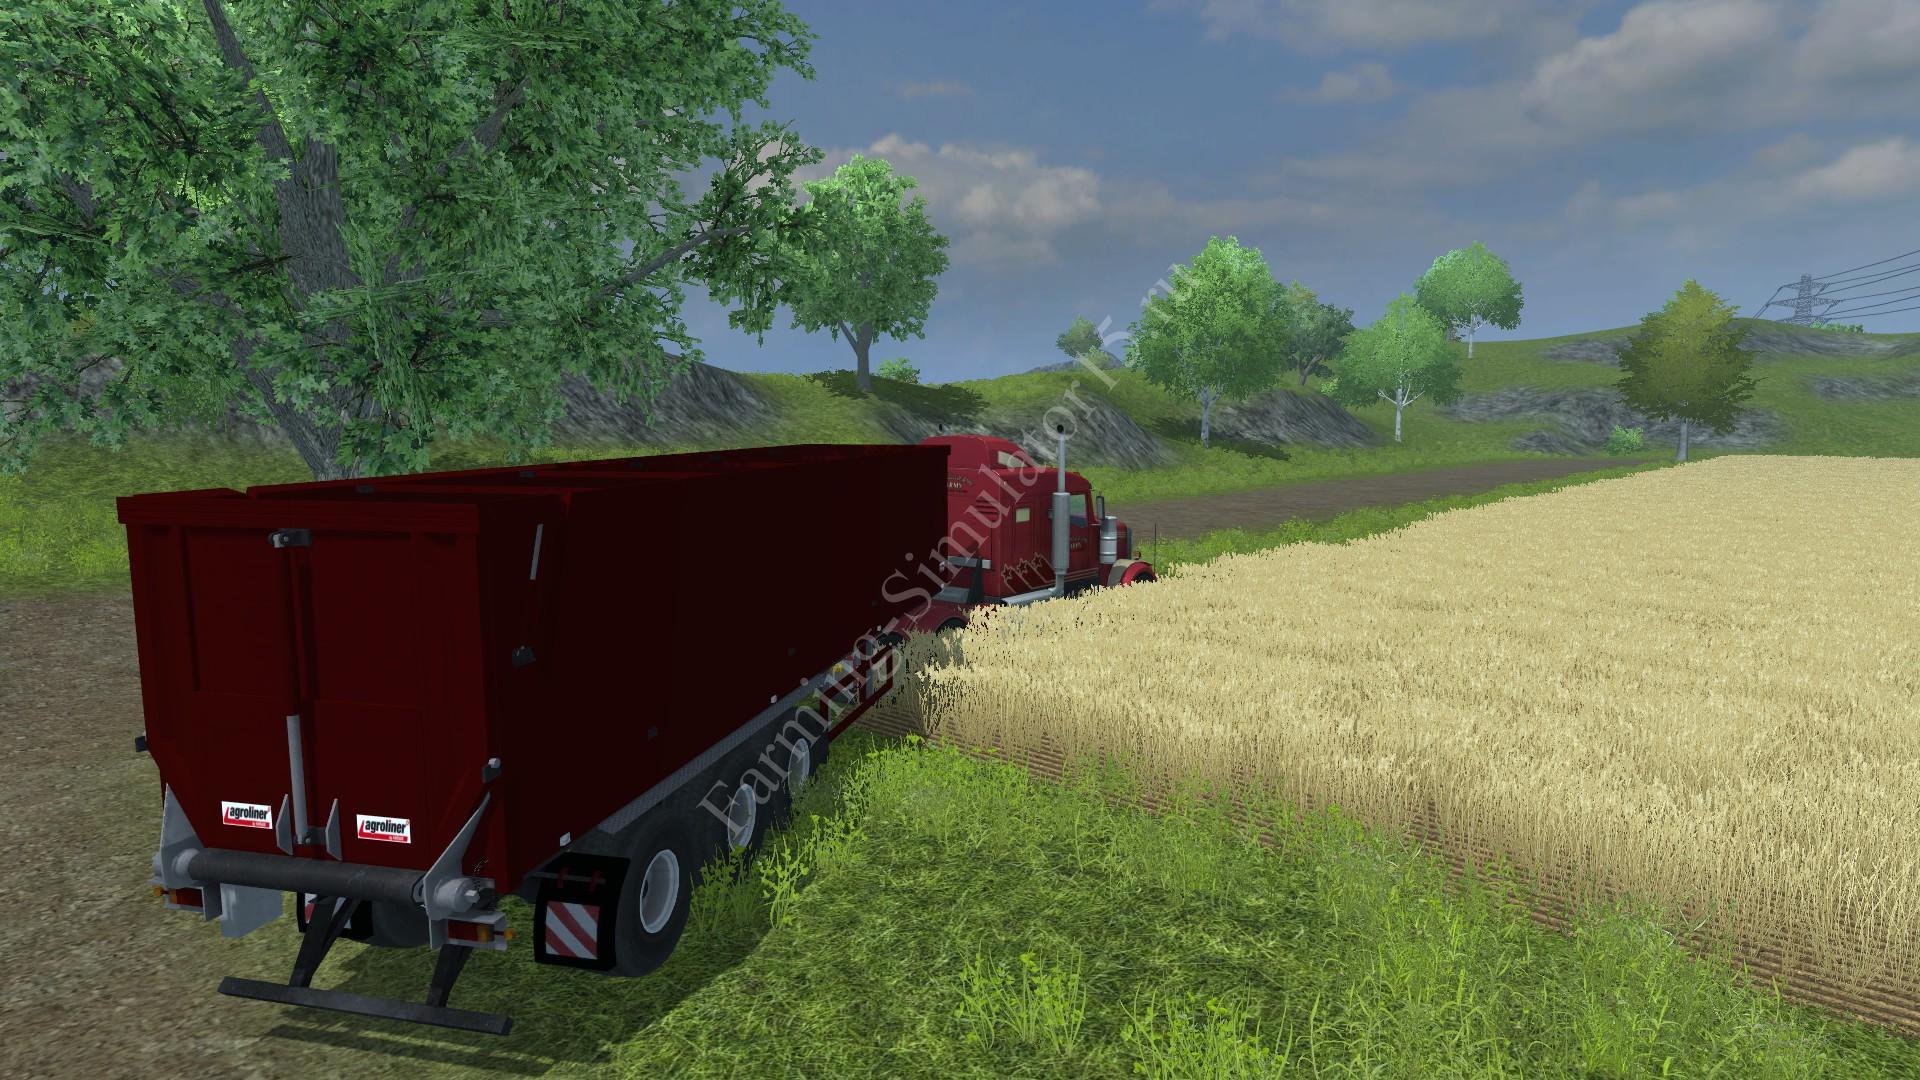 Мод полуприцепа Kroeger Agroliner Dynamic v 1.0 Farming Simulator 2013, Farming Simulator 13